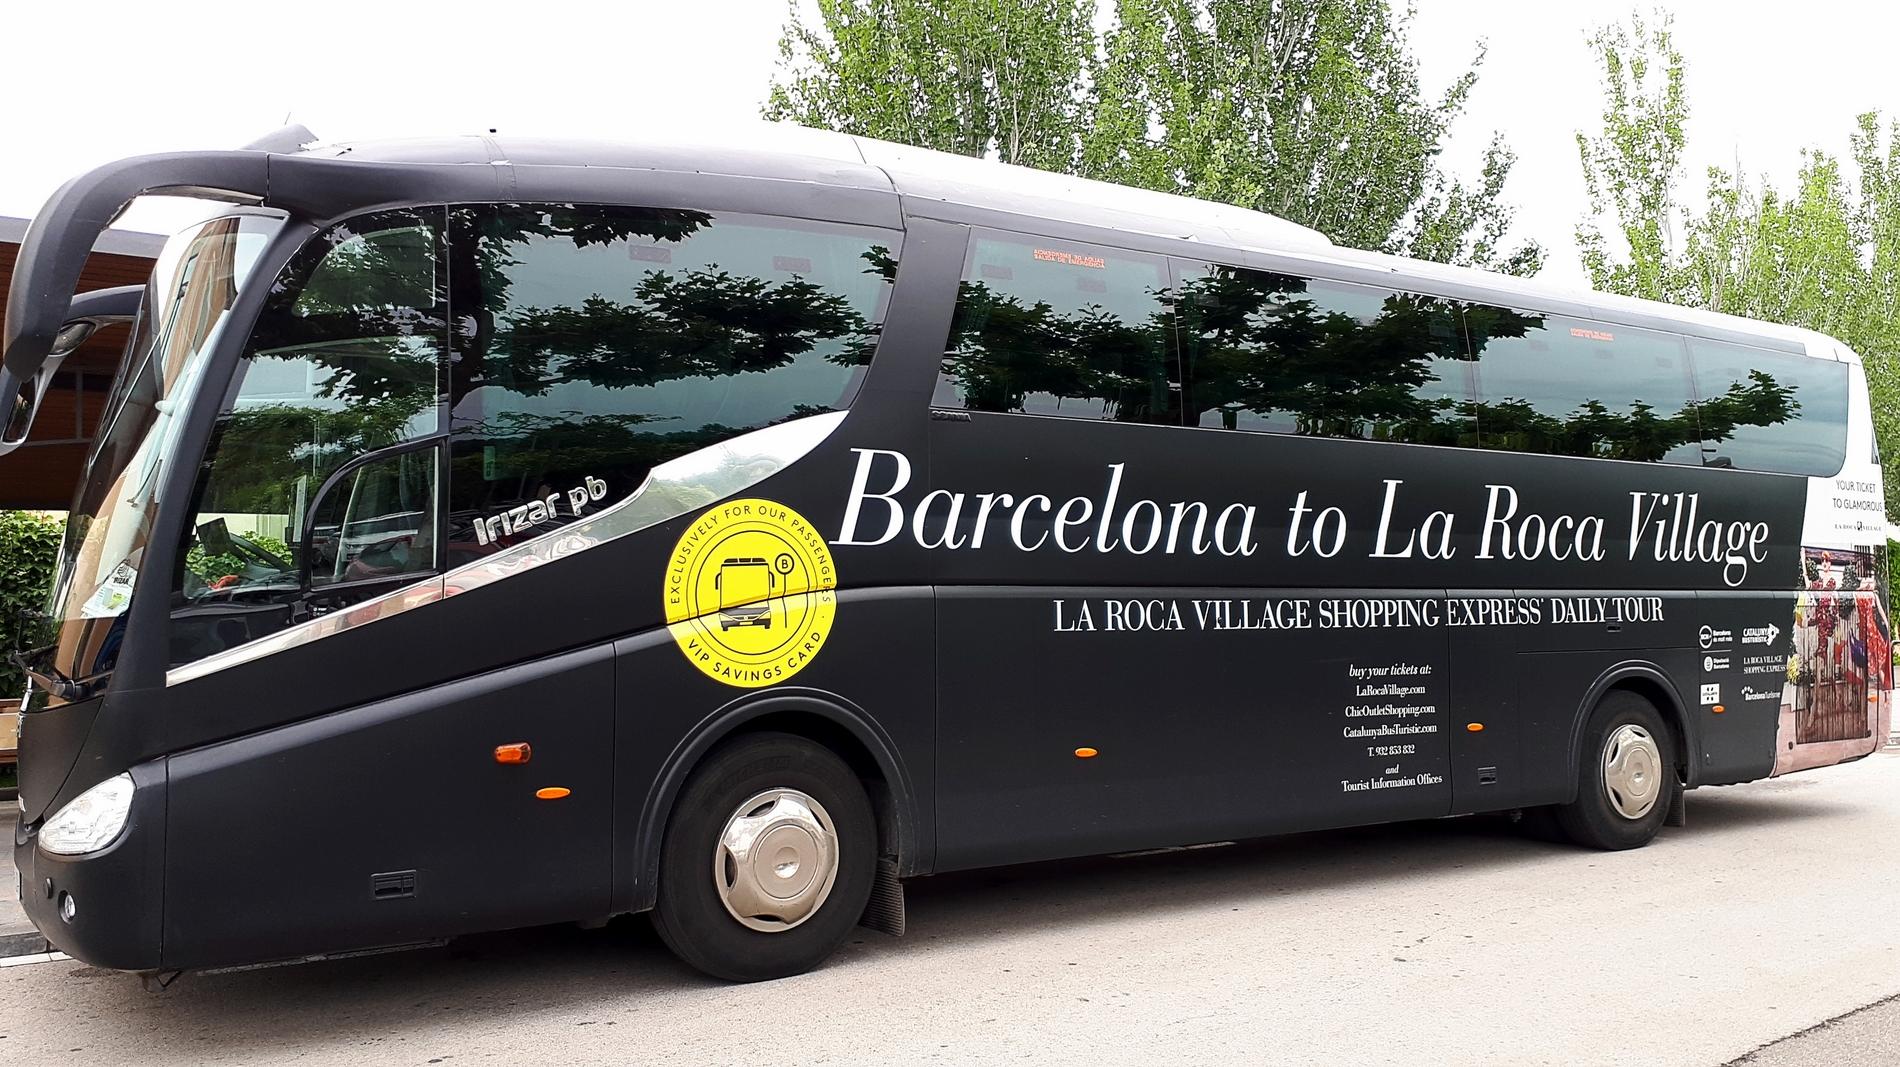 voyage découverte barcelone - bus roca village